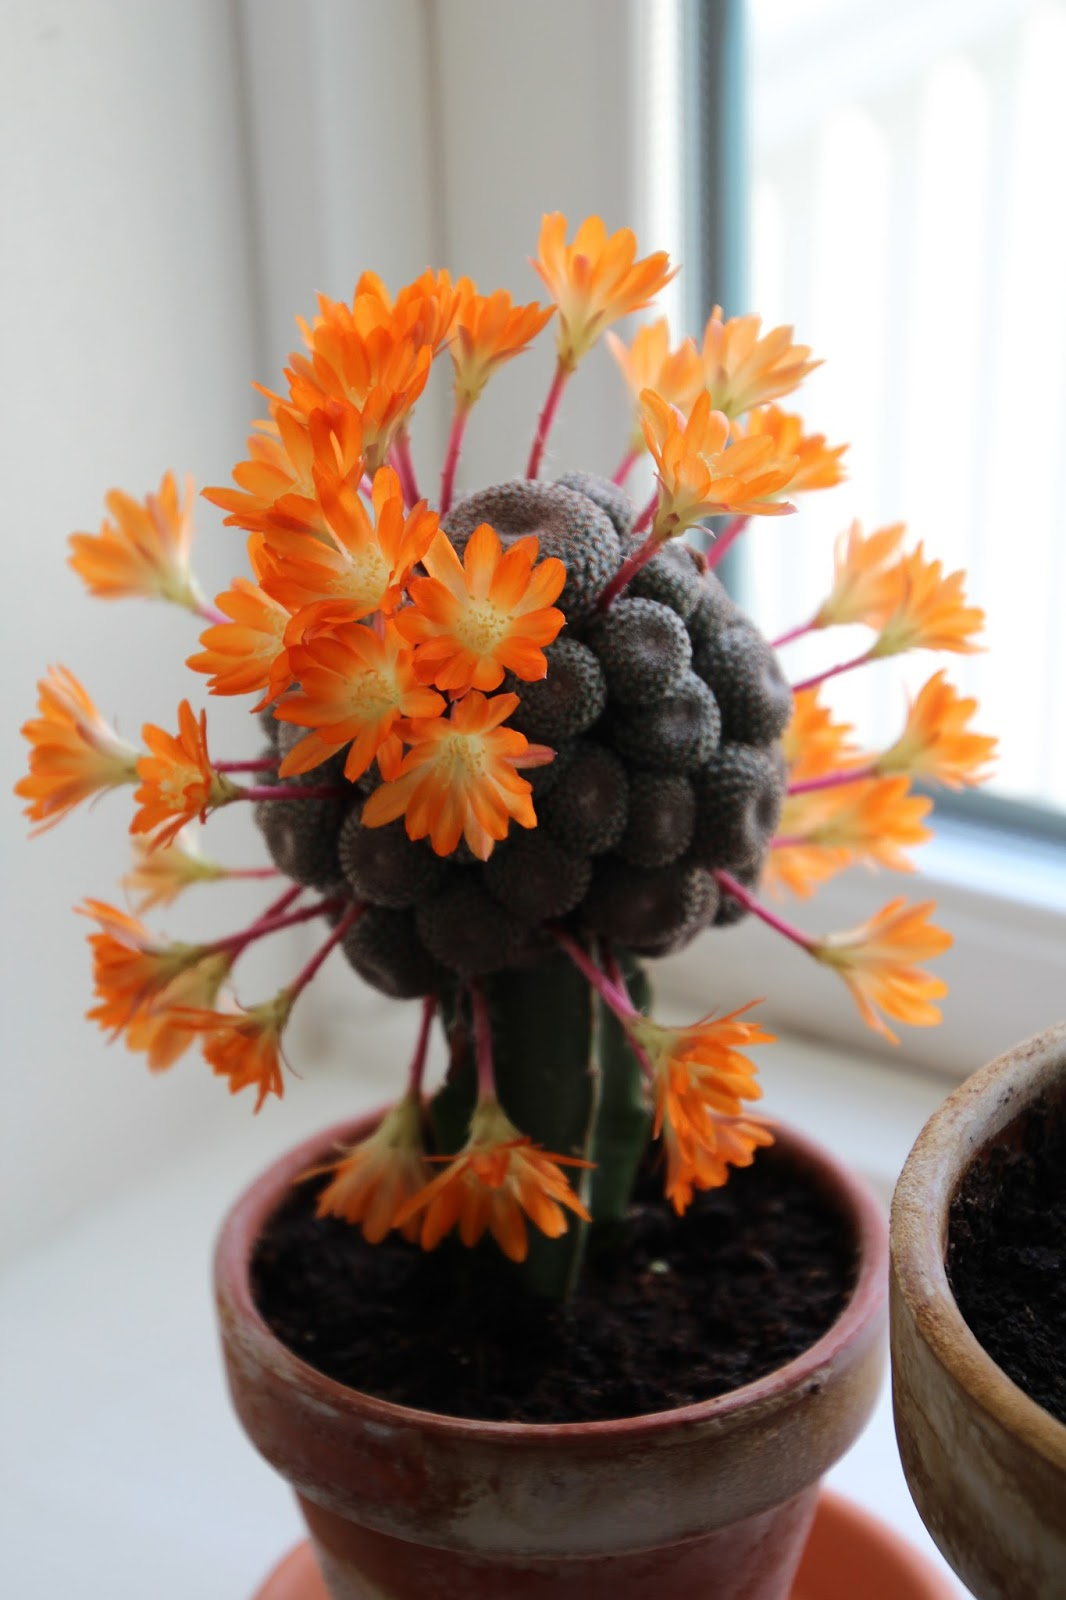 odla kaktusar